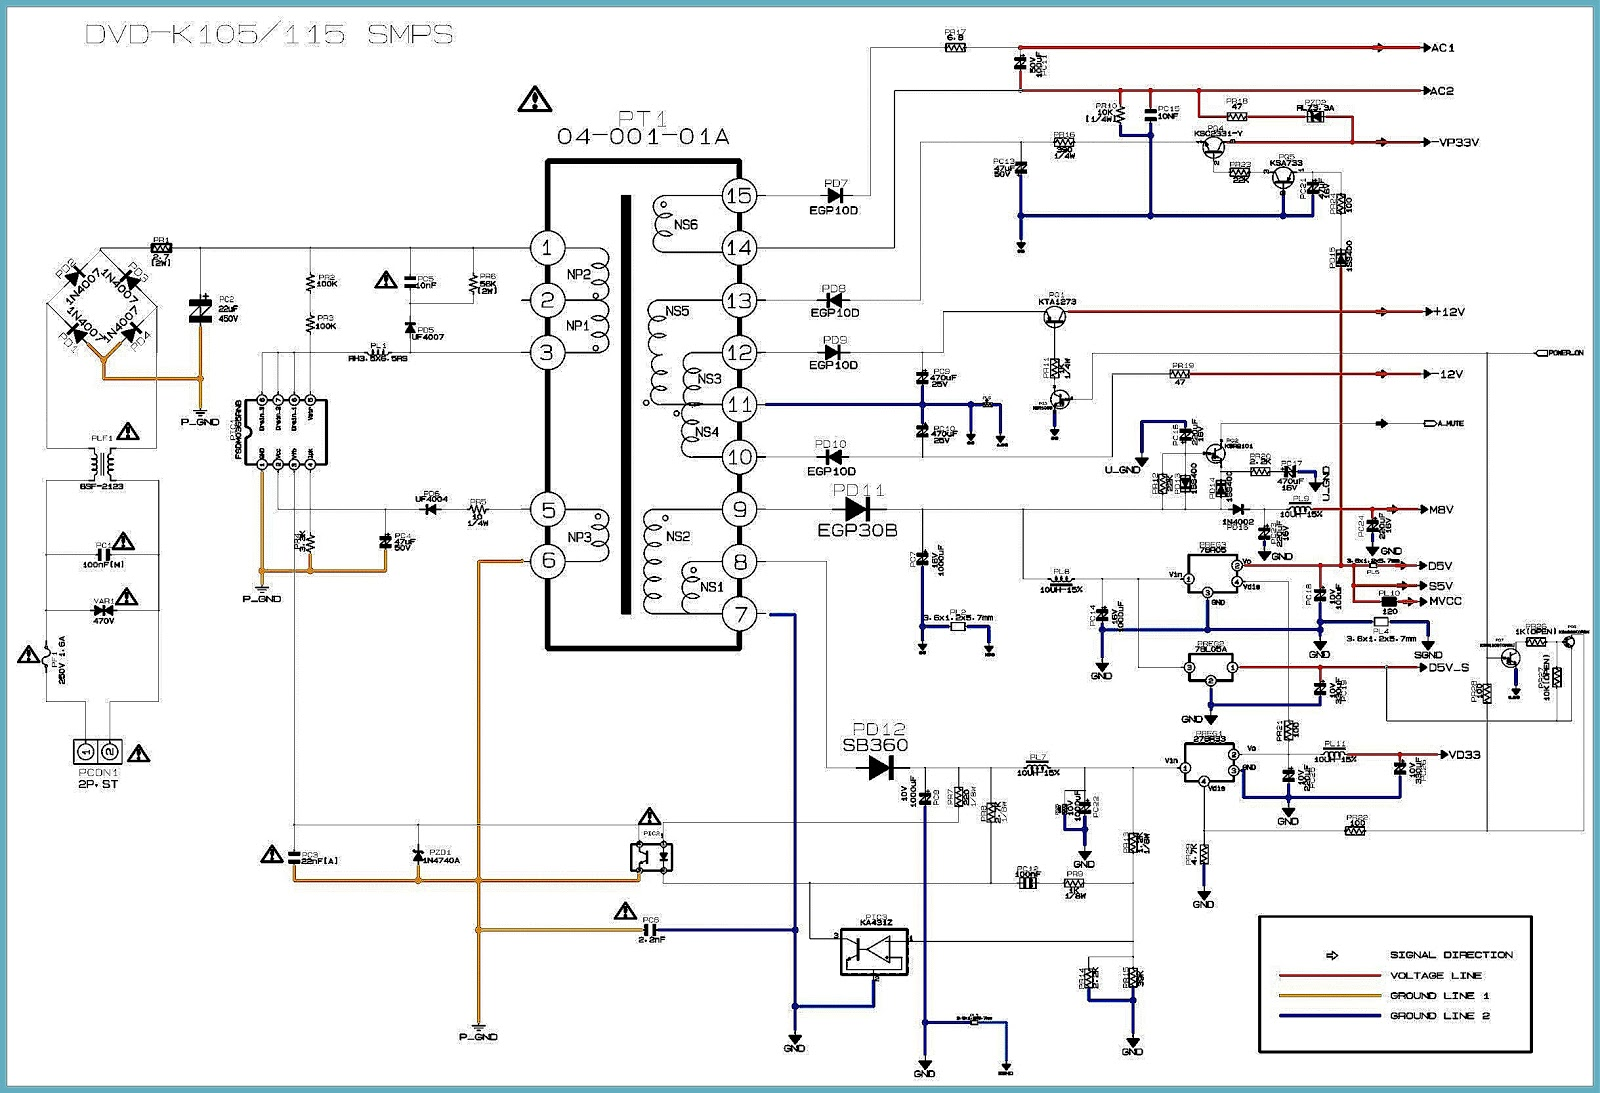 small resolution of dvd wiring diagram wiring diagram page dvd player wiring block dvd circuit diagrams